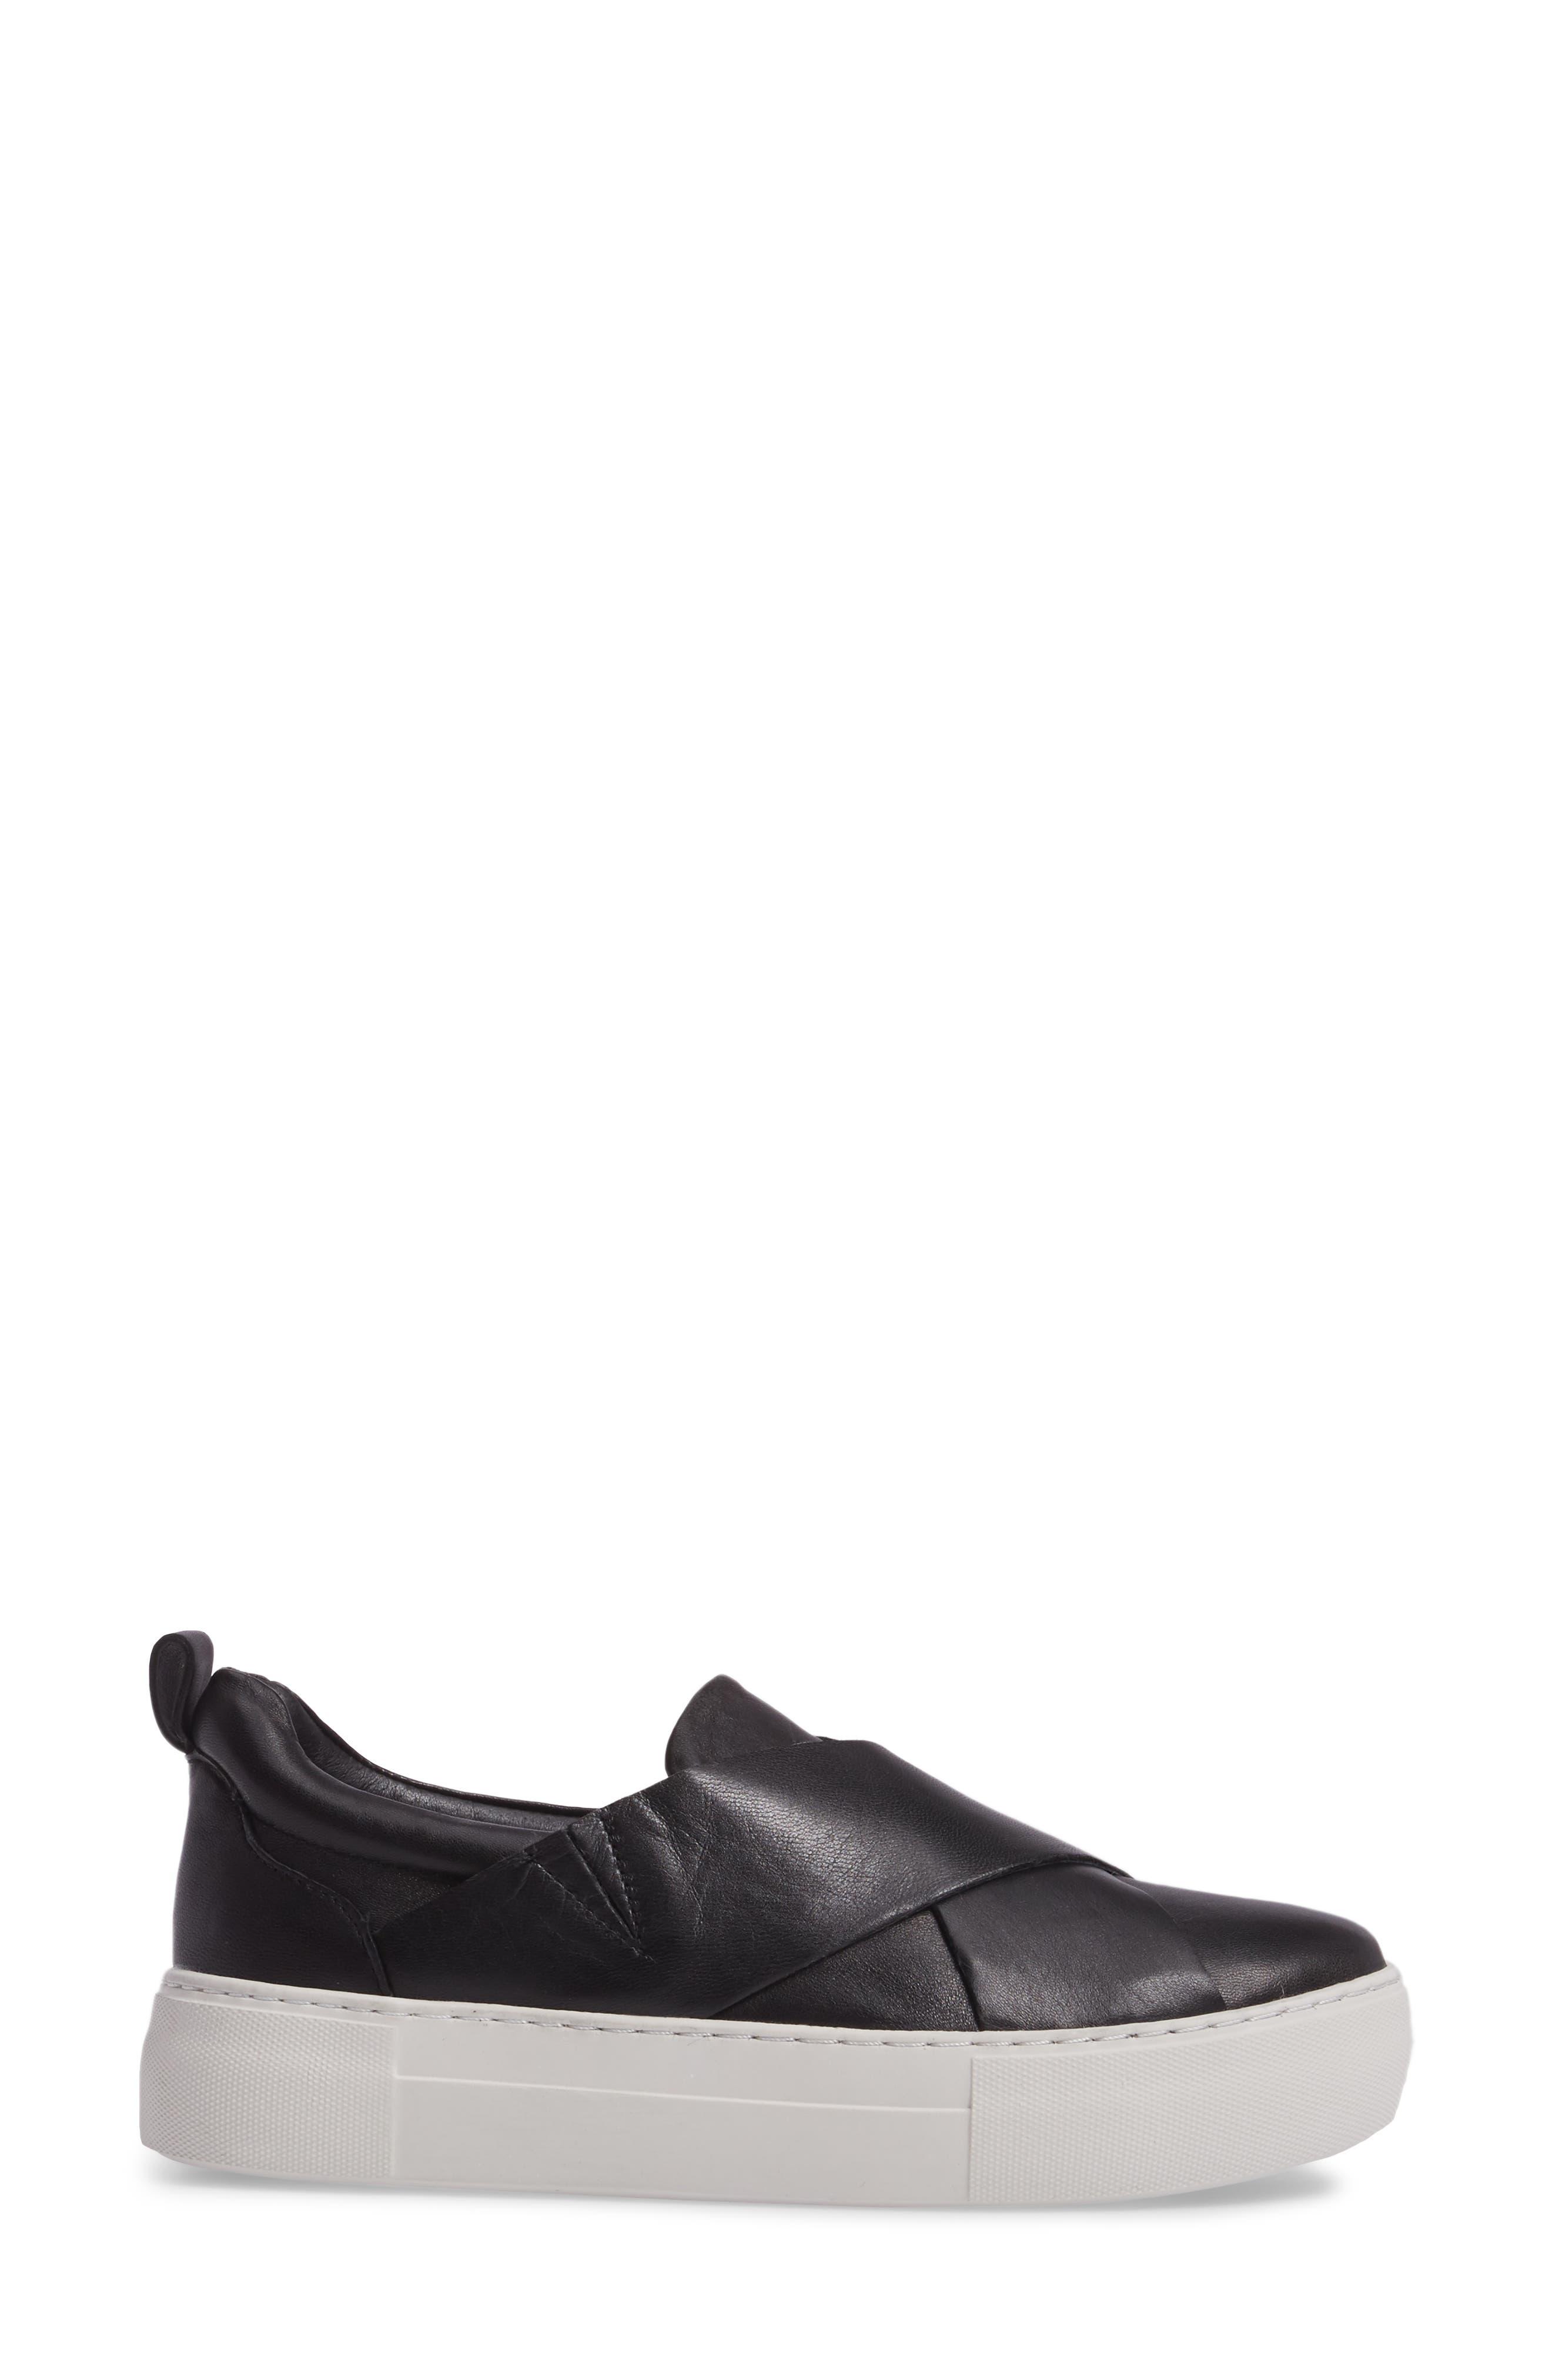 Alec Slip-On Sneaker,                             Alternate thumbnail 3, color,                             015